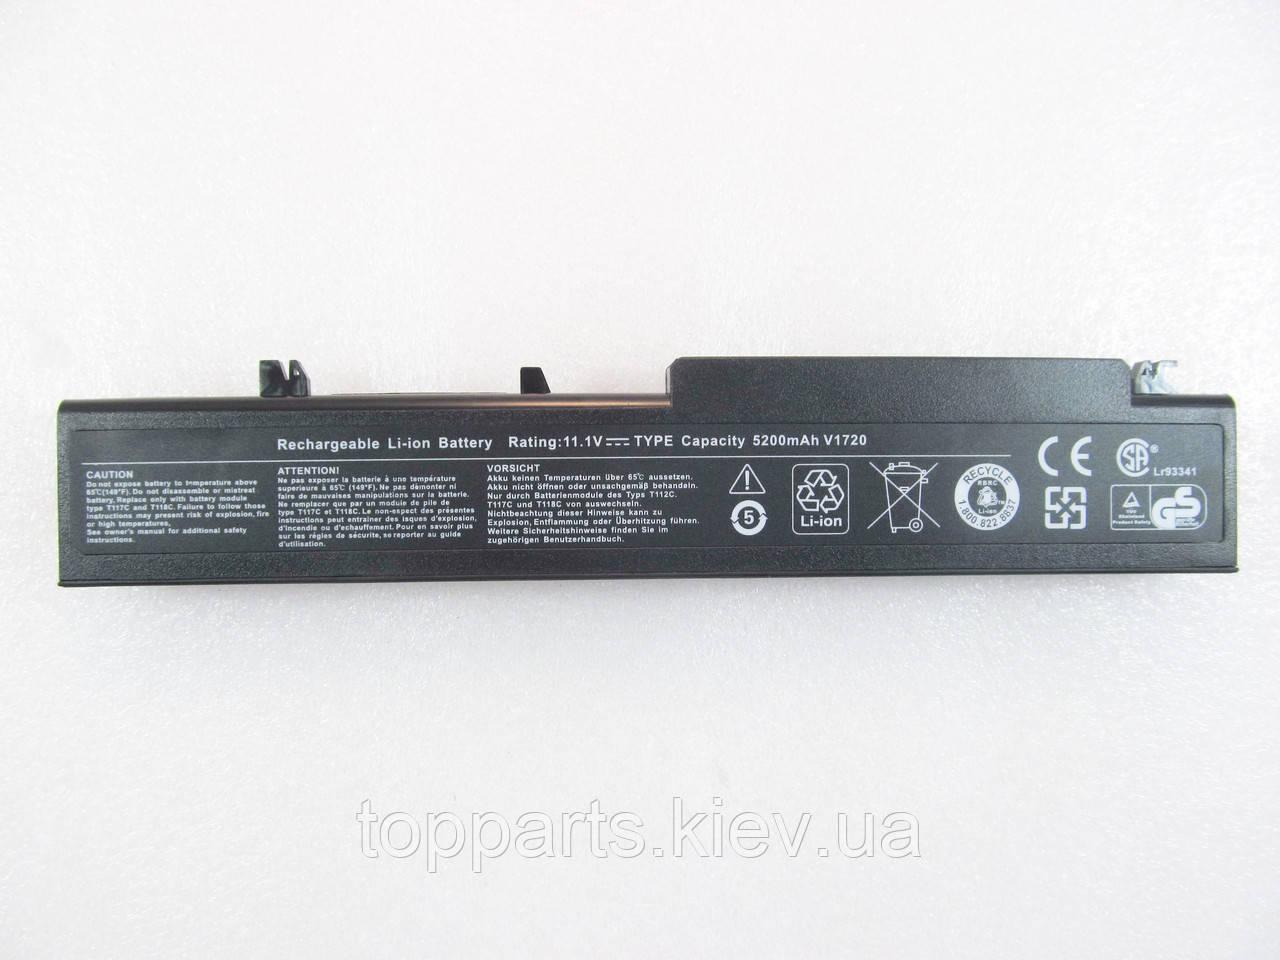 Dell Vostro 1710 T118C, 5200mAh, 6cell, 11.1V, Li-ion, черная, УЦЕНКА